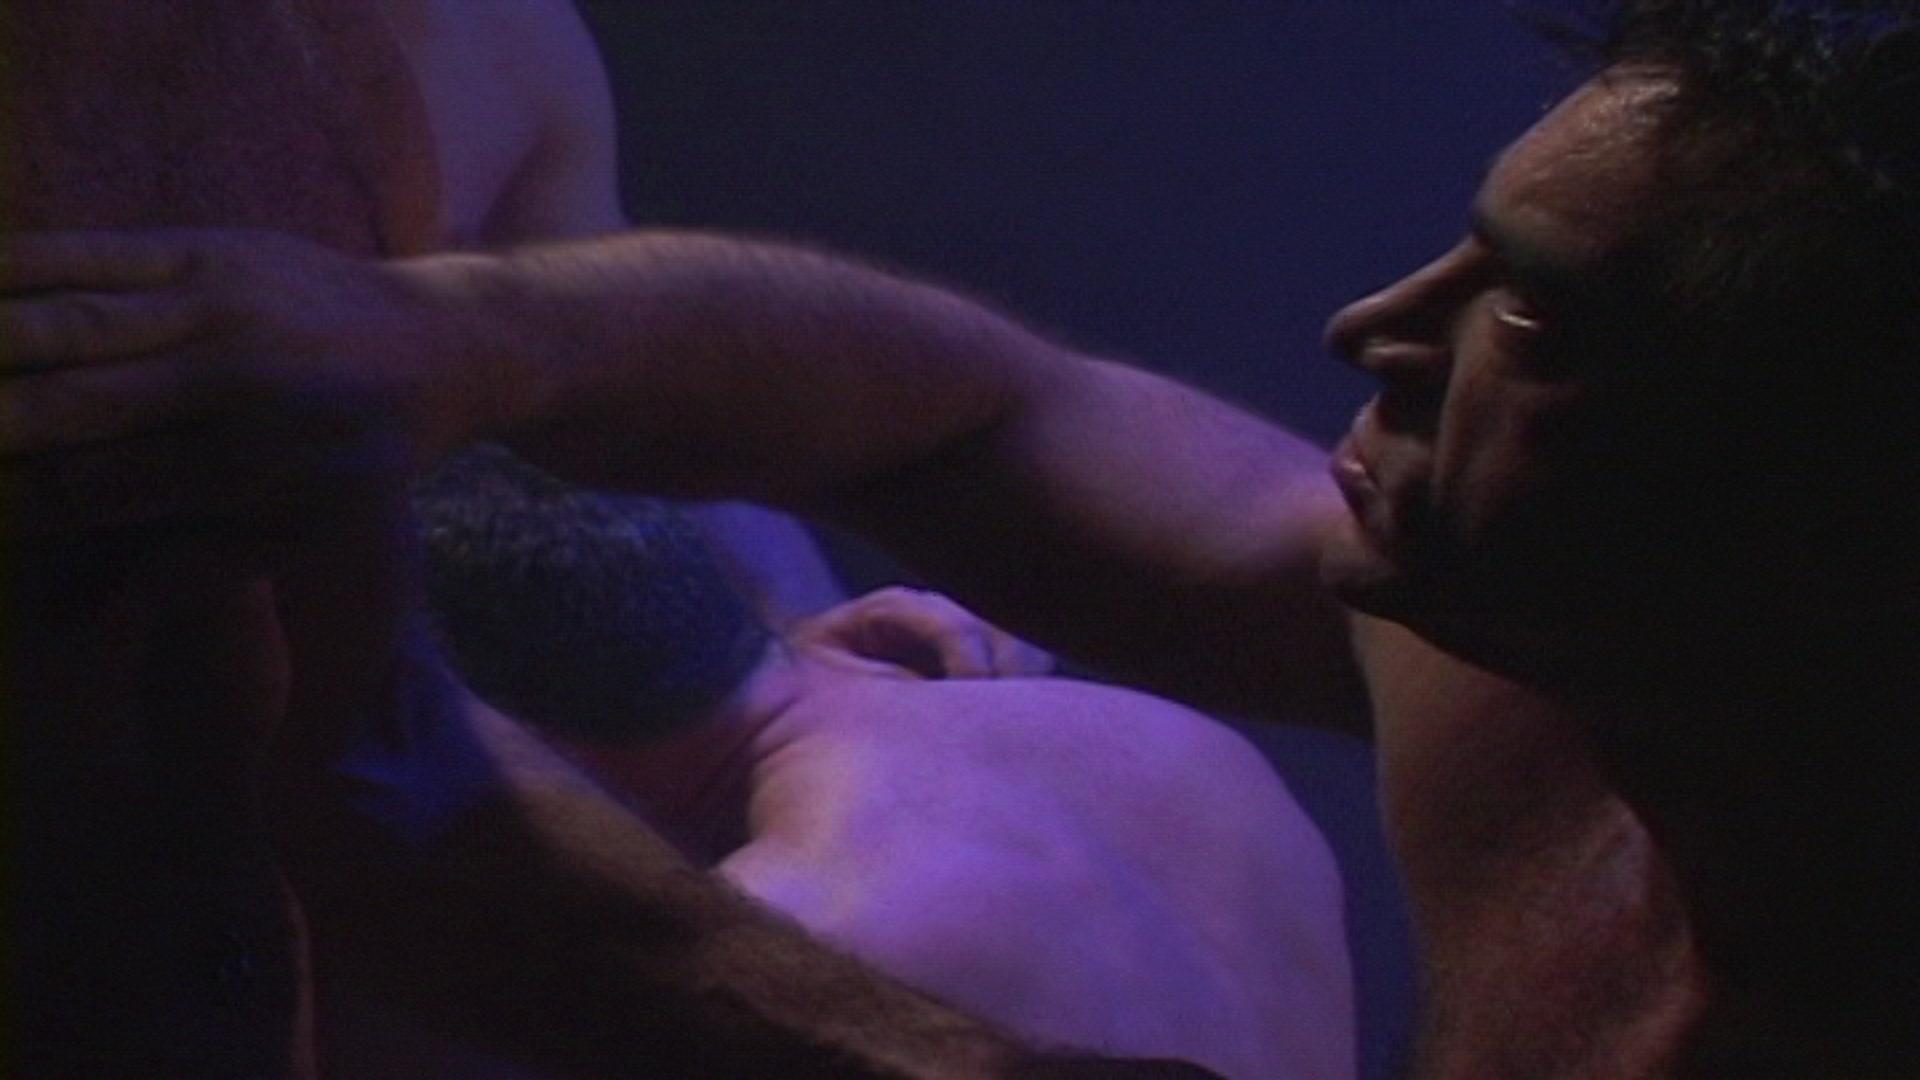 gay male hairy armpit fetish